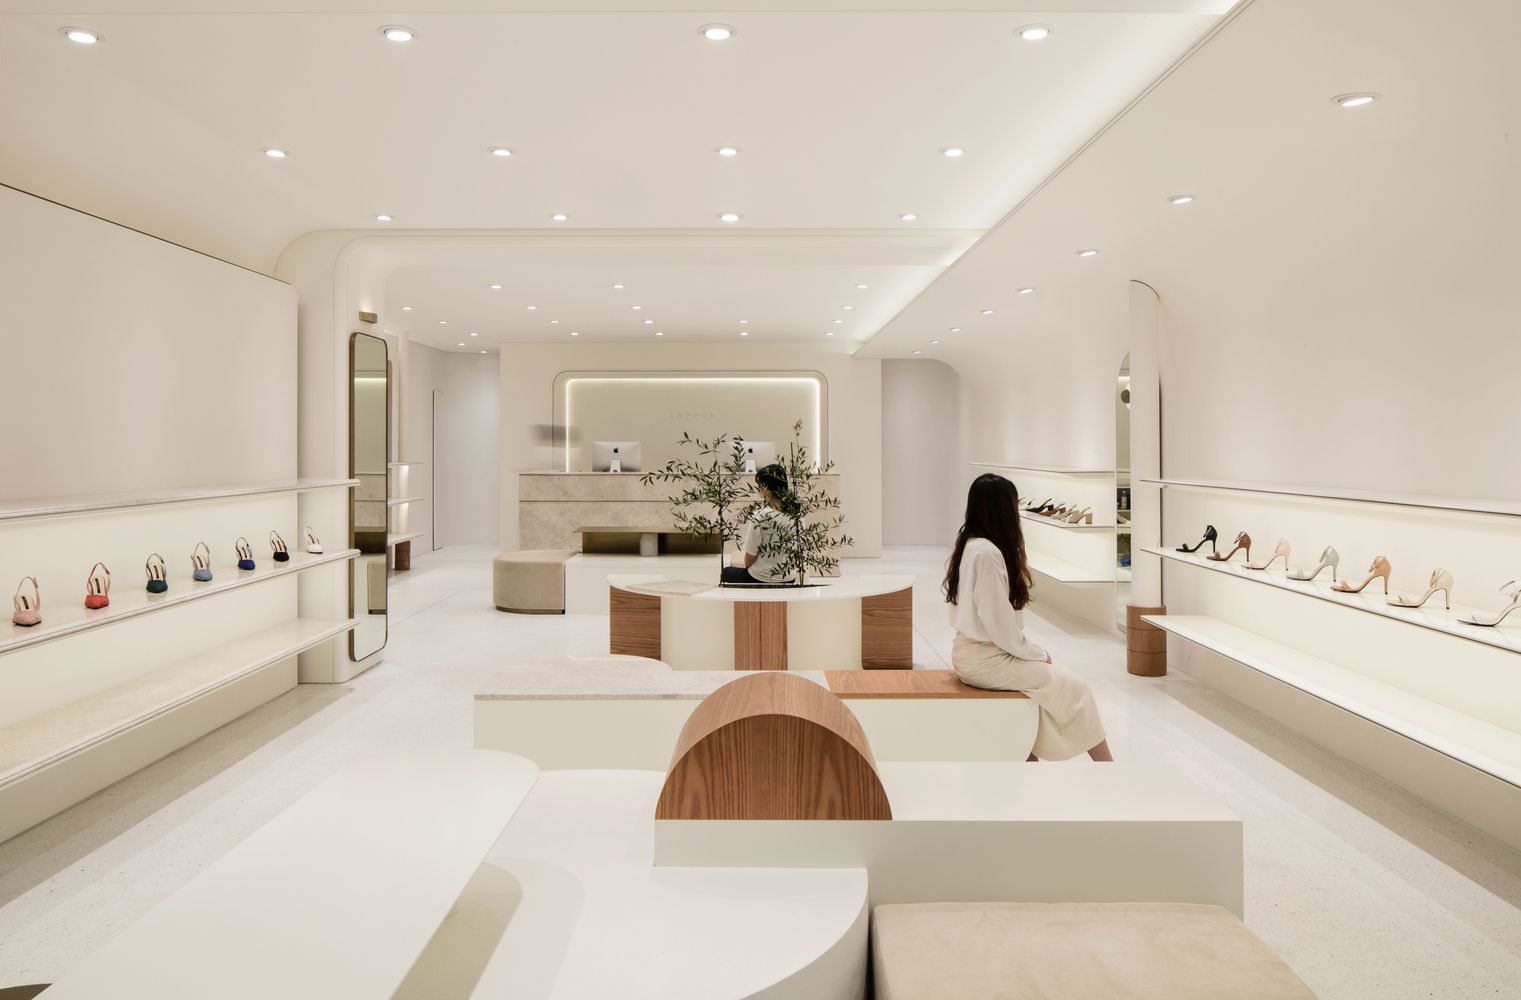 Gallery of Sappun Flagship Store / LABOTORY 3 Retail